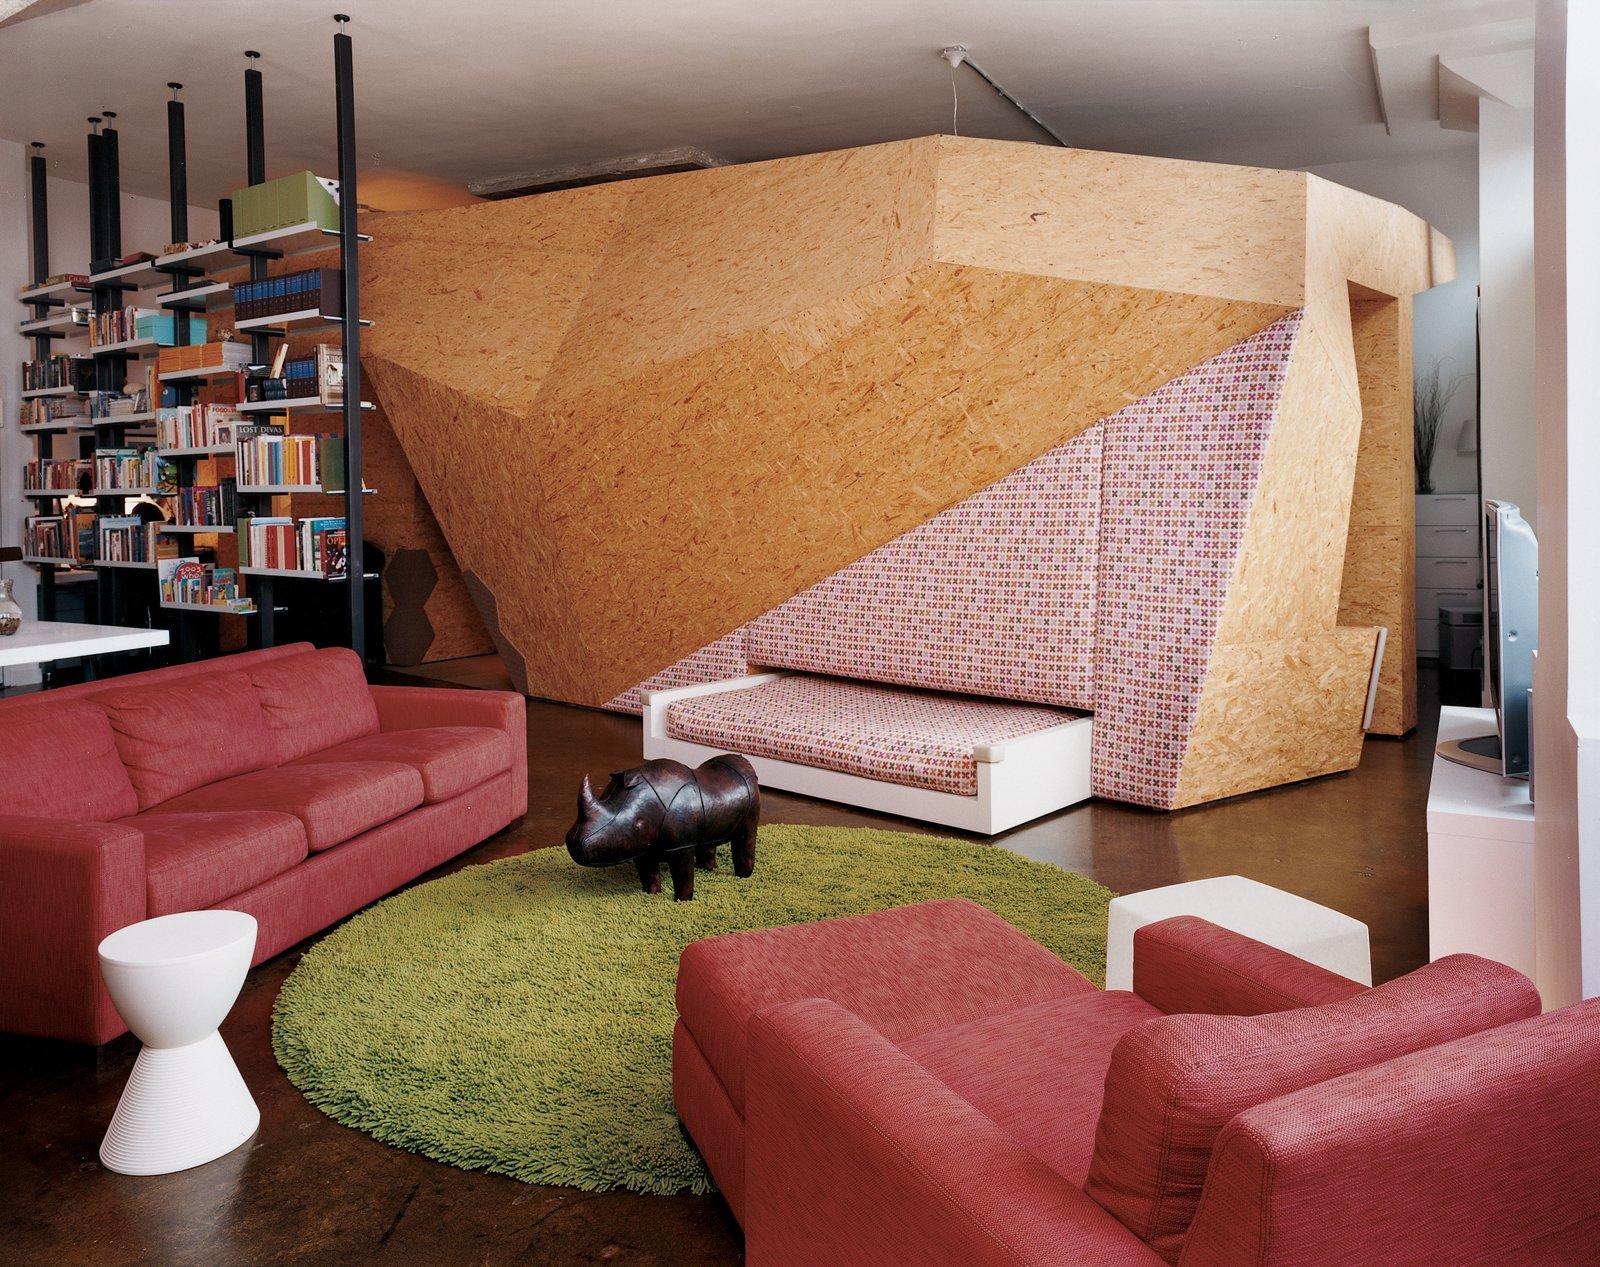 #livingroom #brooklyn #loft #skylights #rug #hiddenbedroom  Photo by Jesse Chehak   Tips for Creating a Comfortable Living Room by Drew McGukin